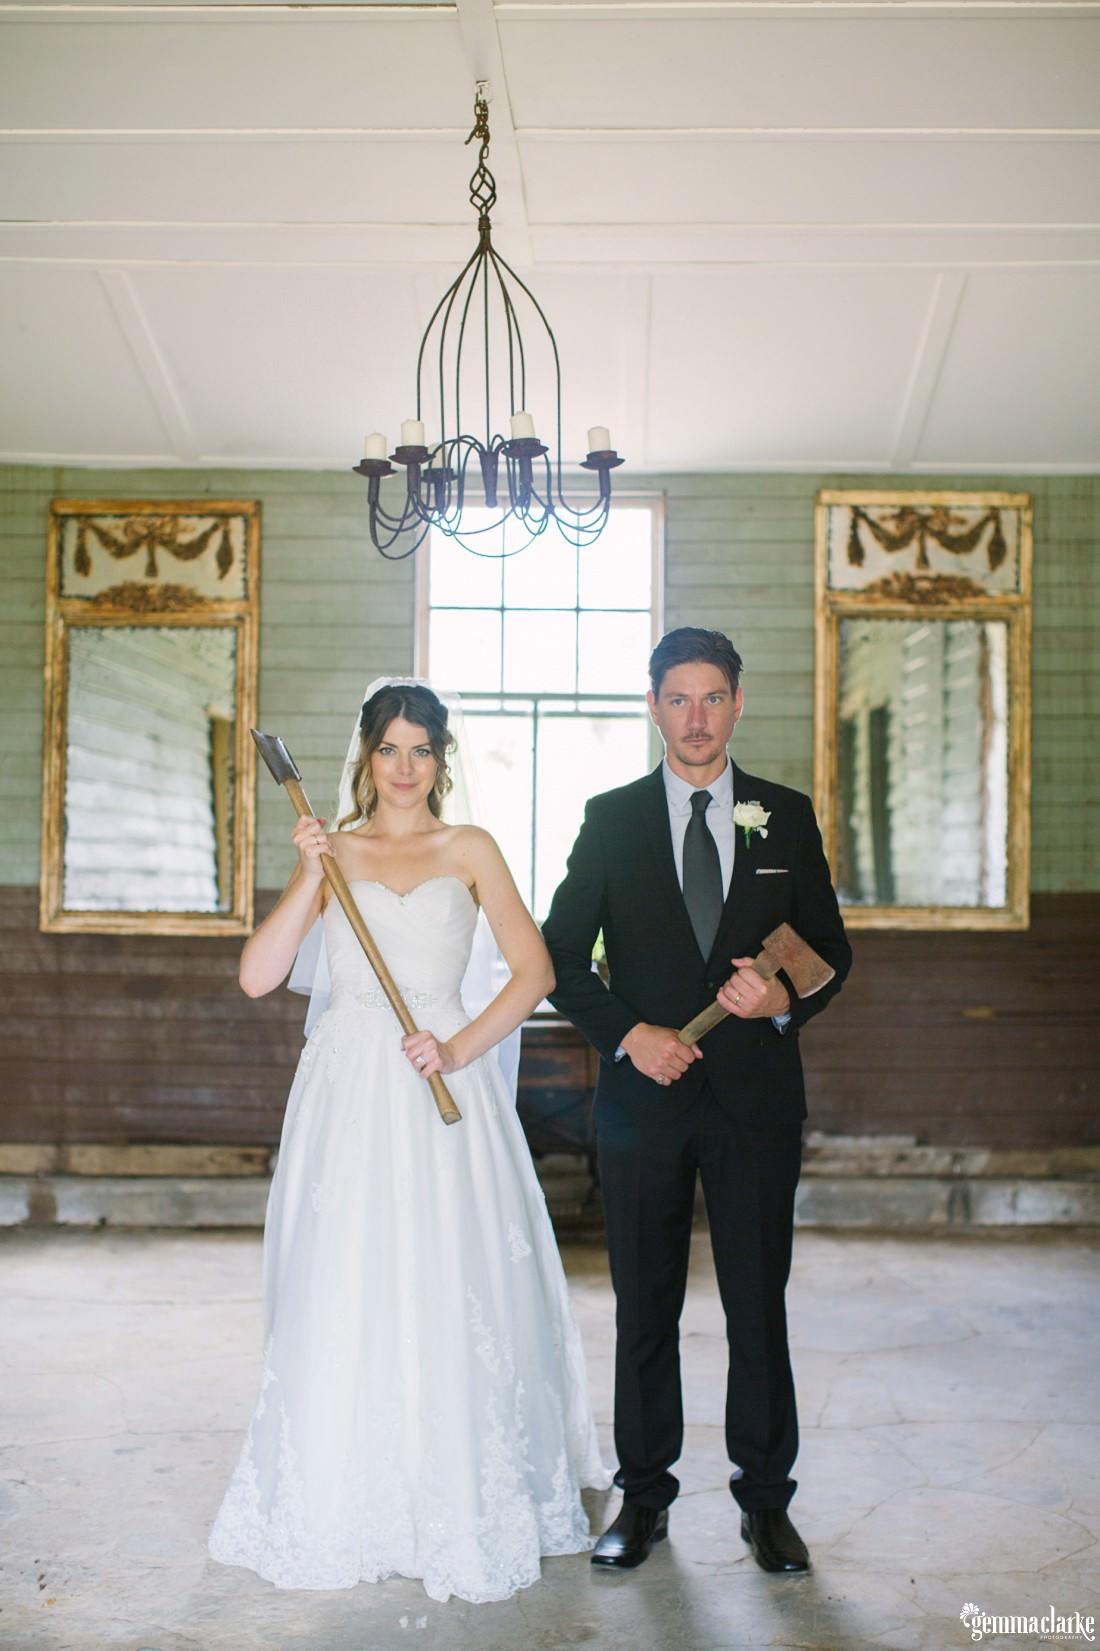 gemma-clarke-photography_summerlees-wedding_southern-highlands-wedding_erin-and-alistair_0055